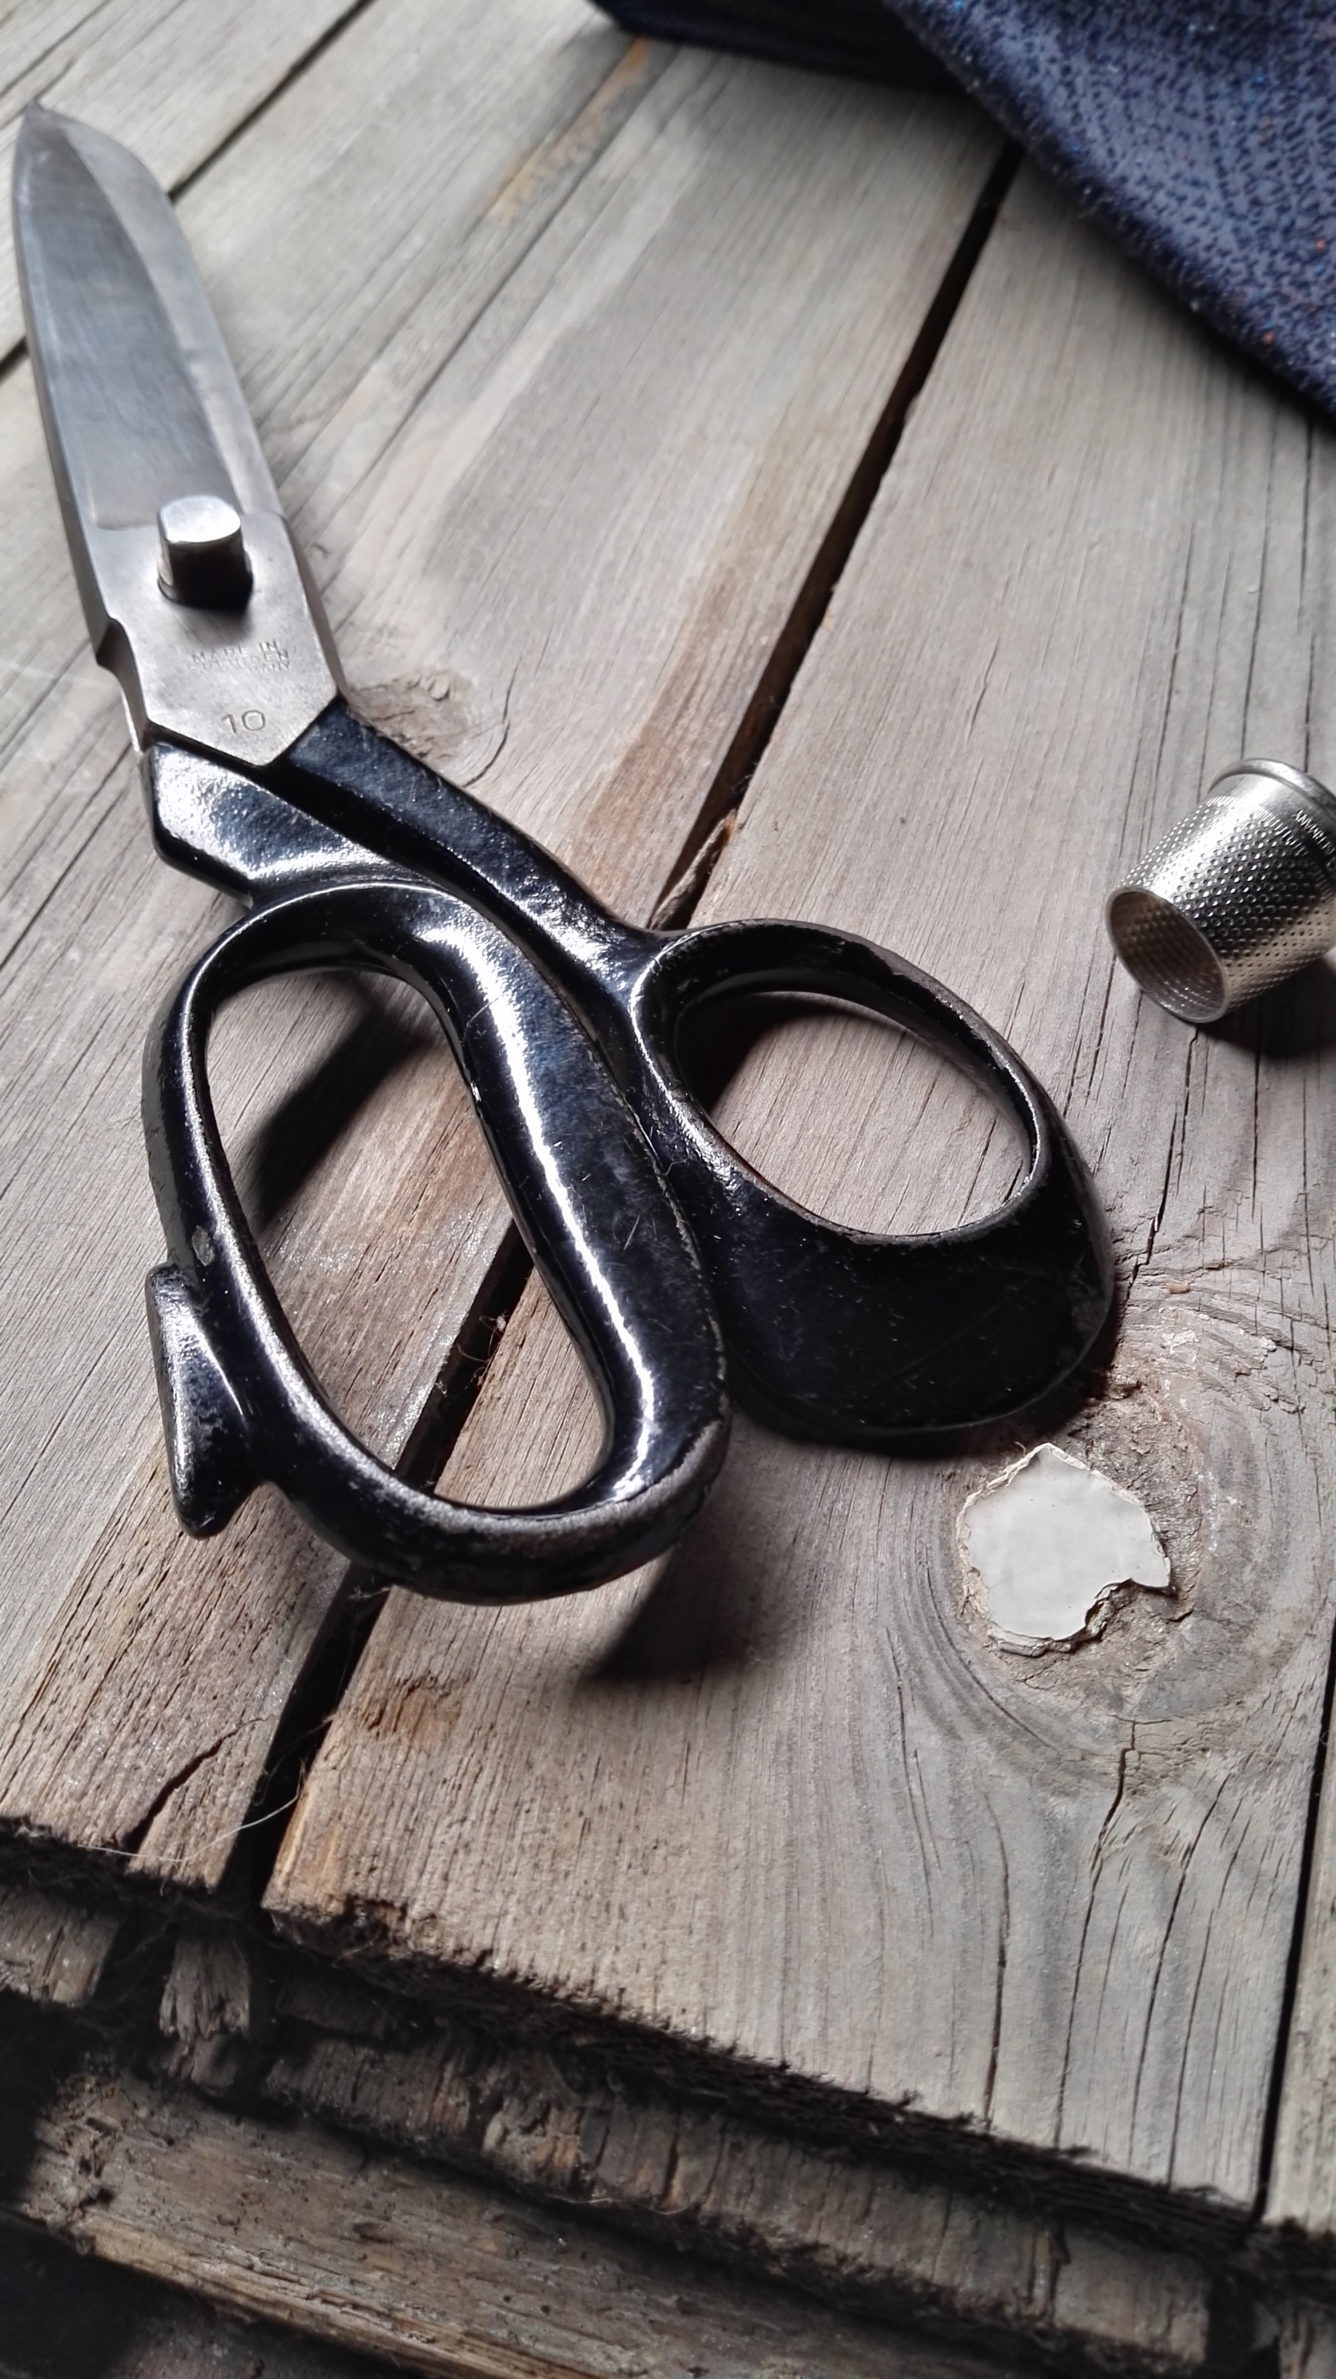 skillful fingers, making a tie, handrolling hem